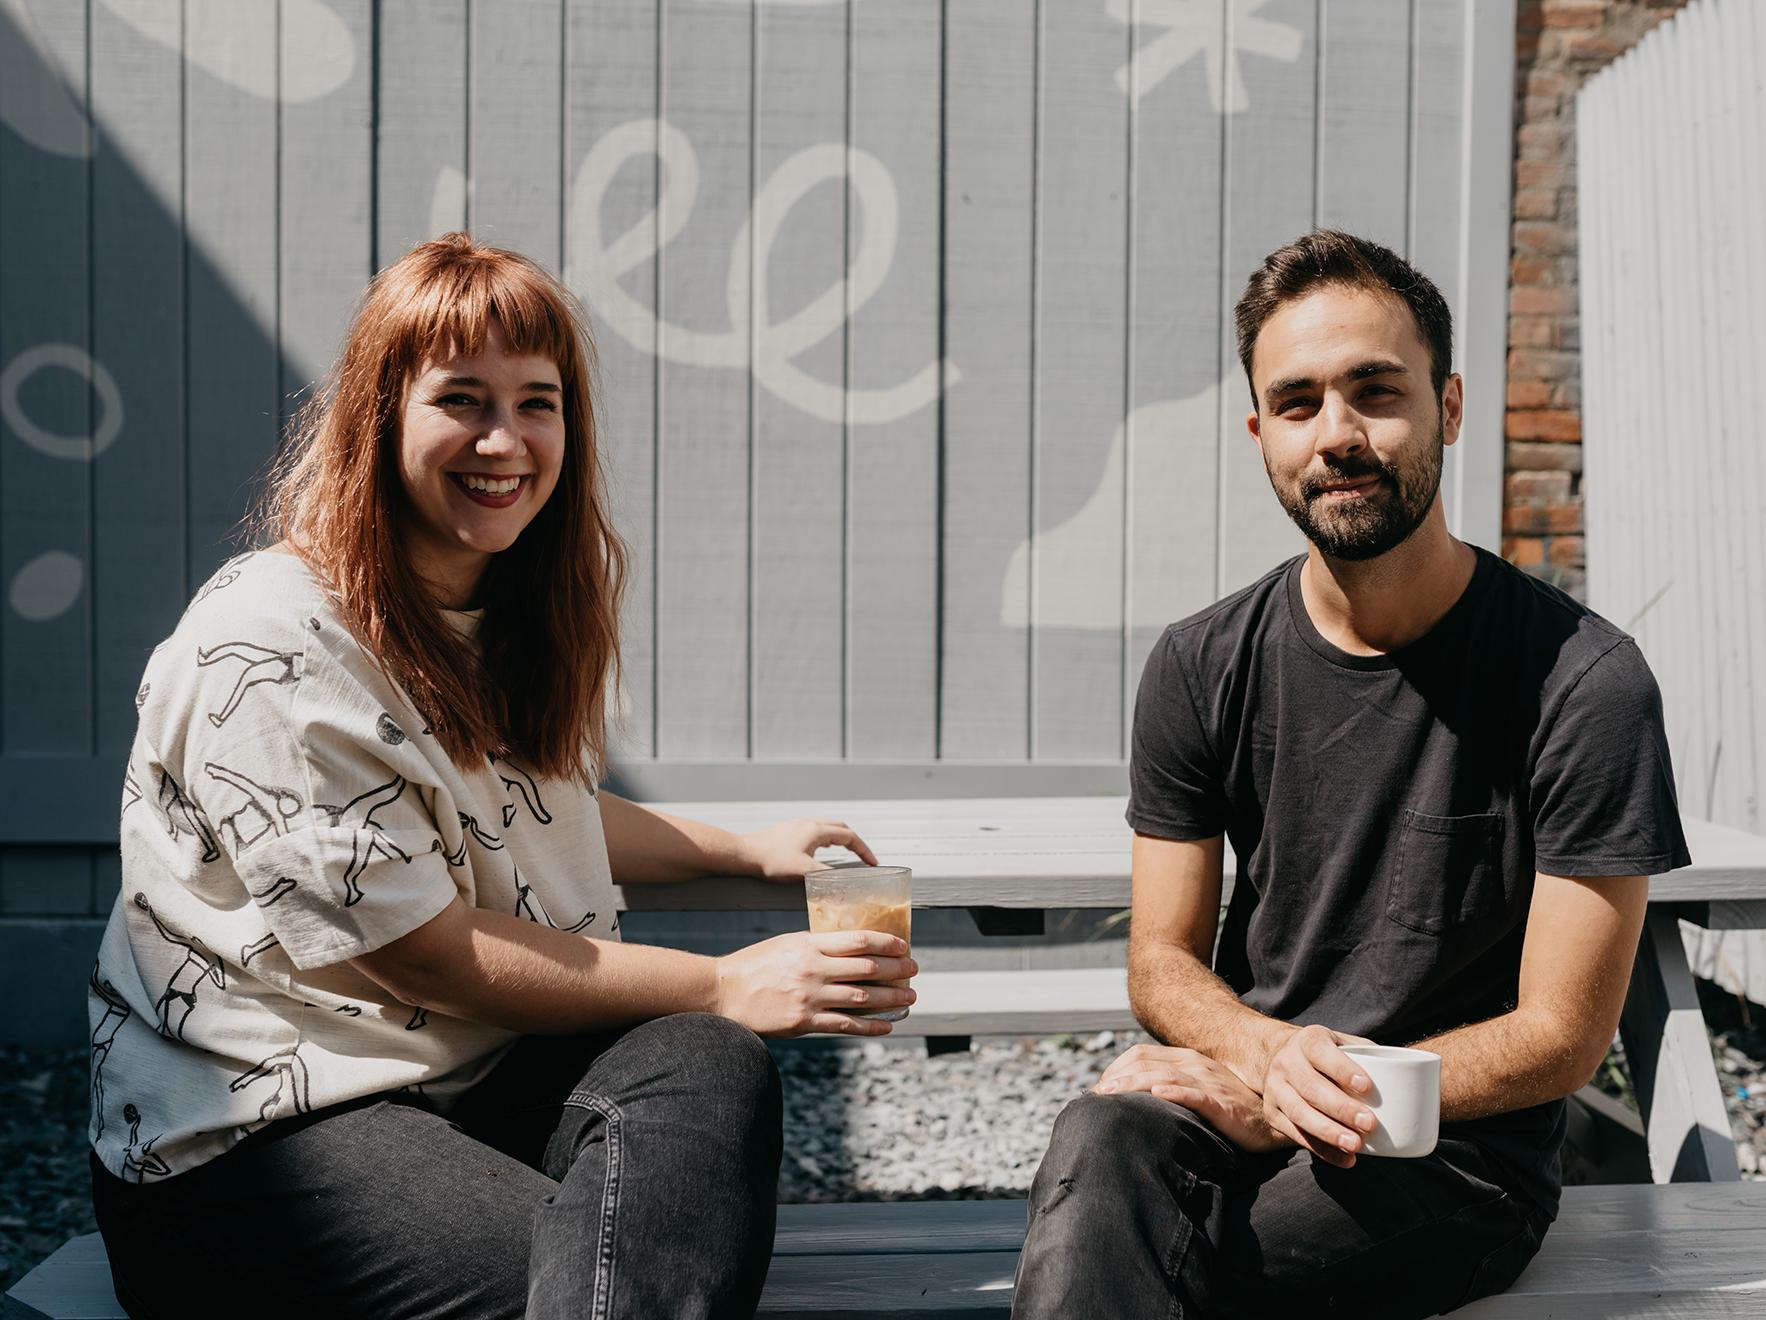 Co-owners Felicity Jones + Mike Romig